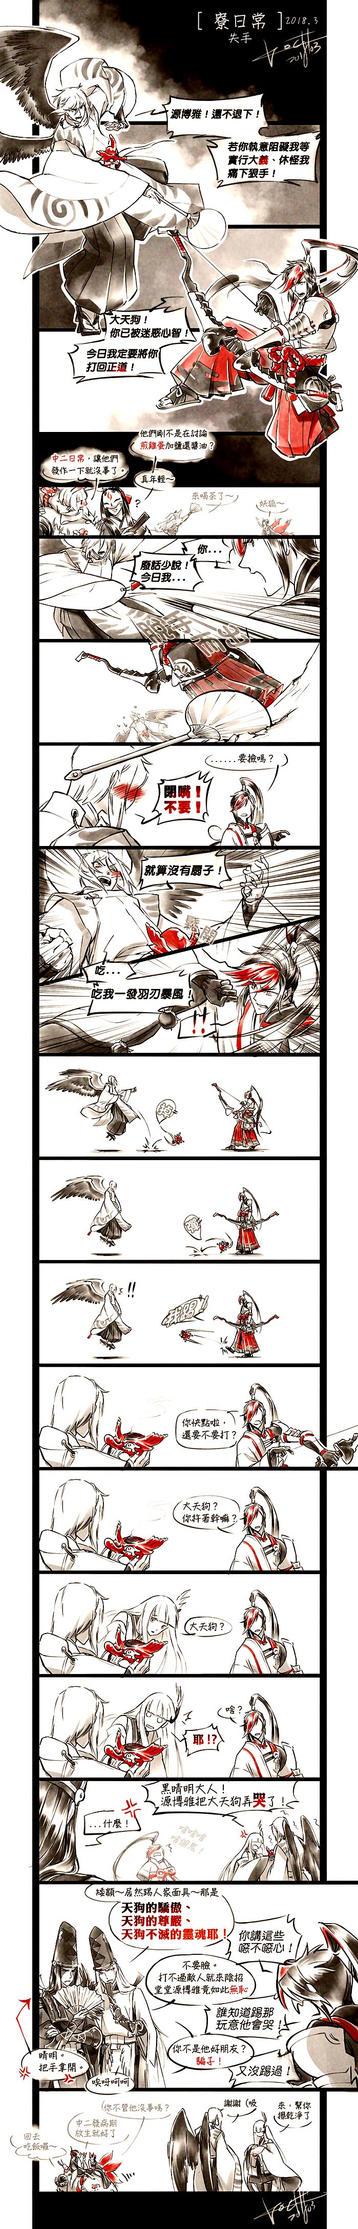 Onmyoji - Tengu and Fox (Chinese version) by koch43